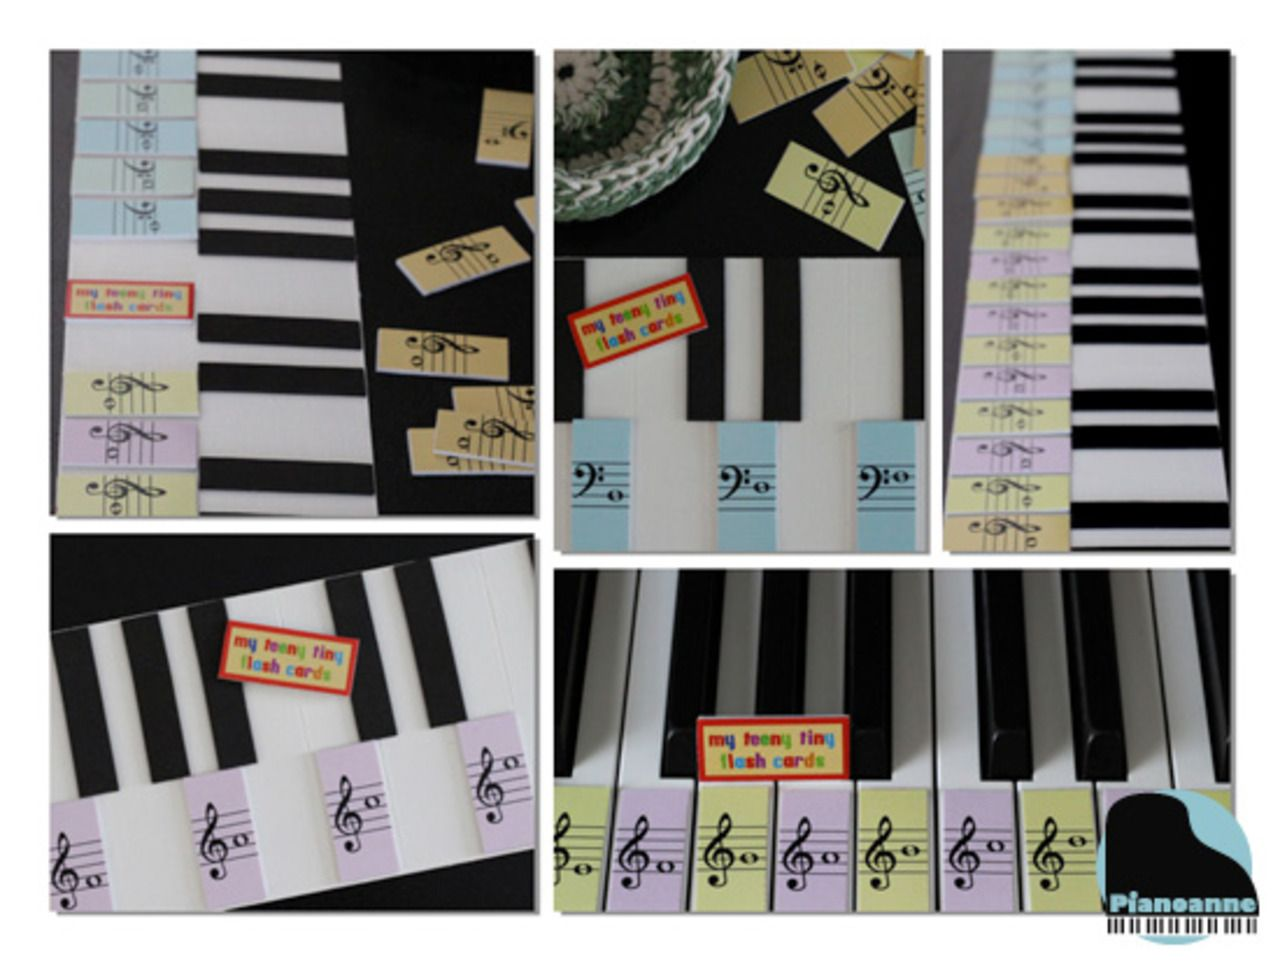 Pianoanne Teeny Tiny Flash Card Diy Piano Teaching Resources Piano Teaching Learn Piano [ 961 x 1280 Pixel ]